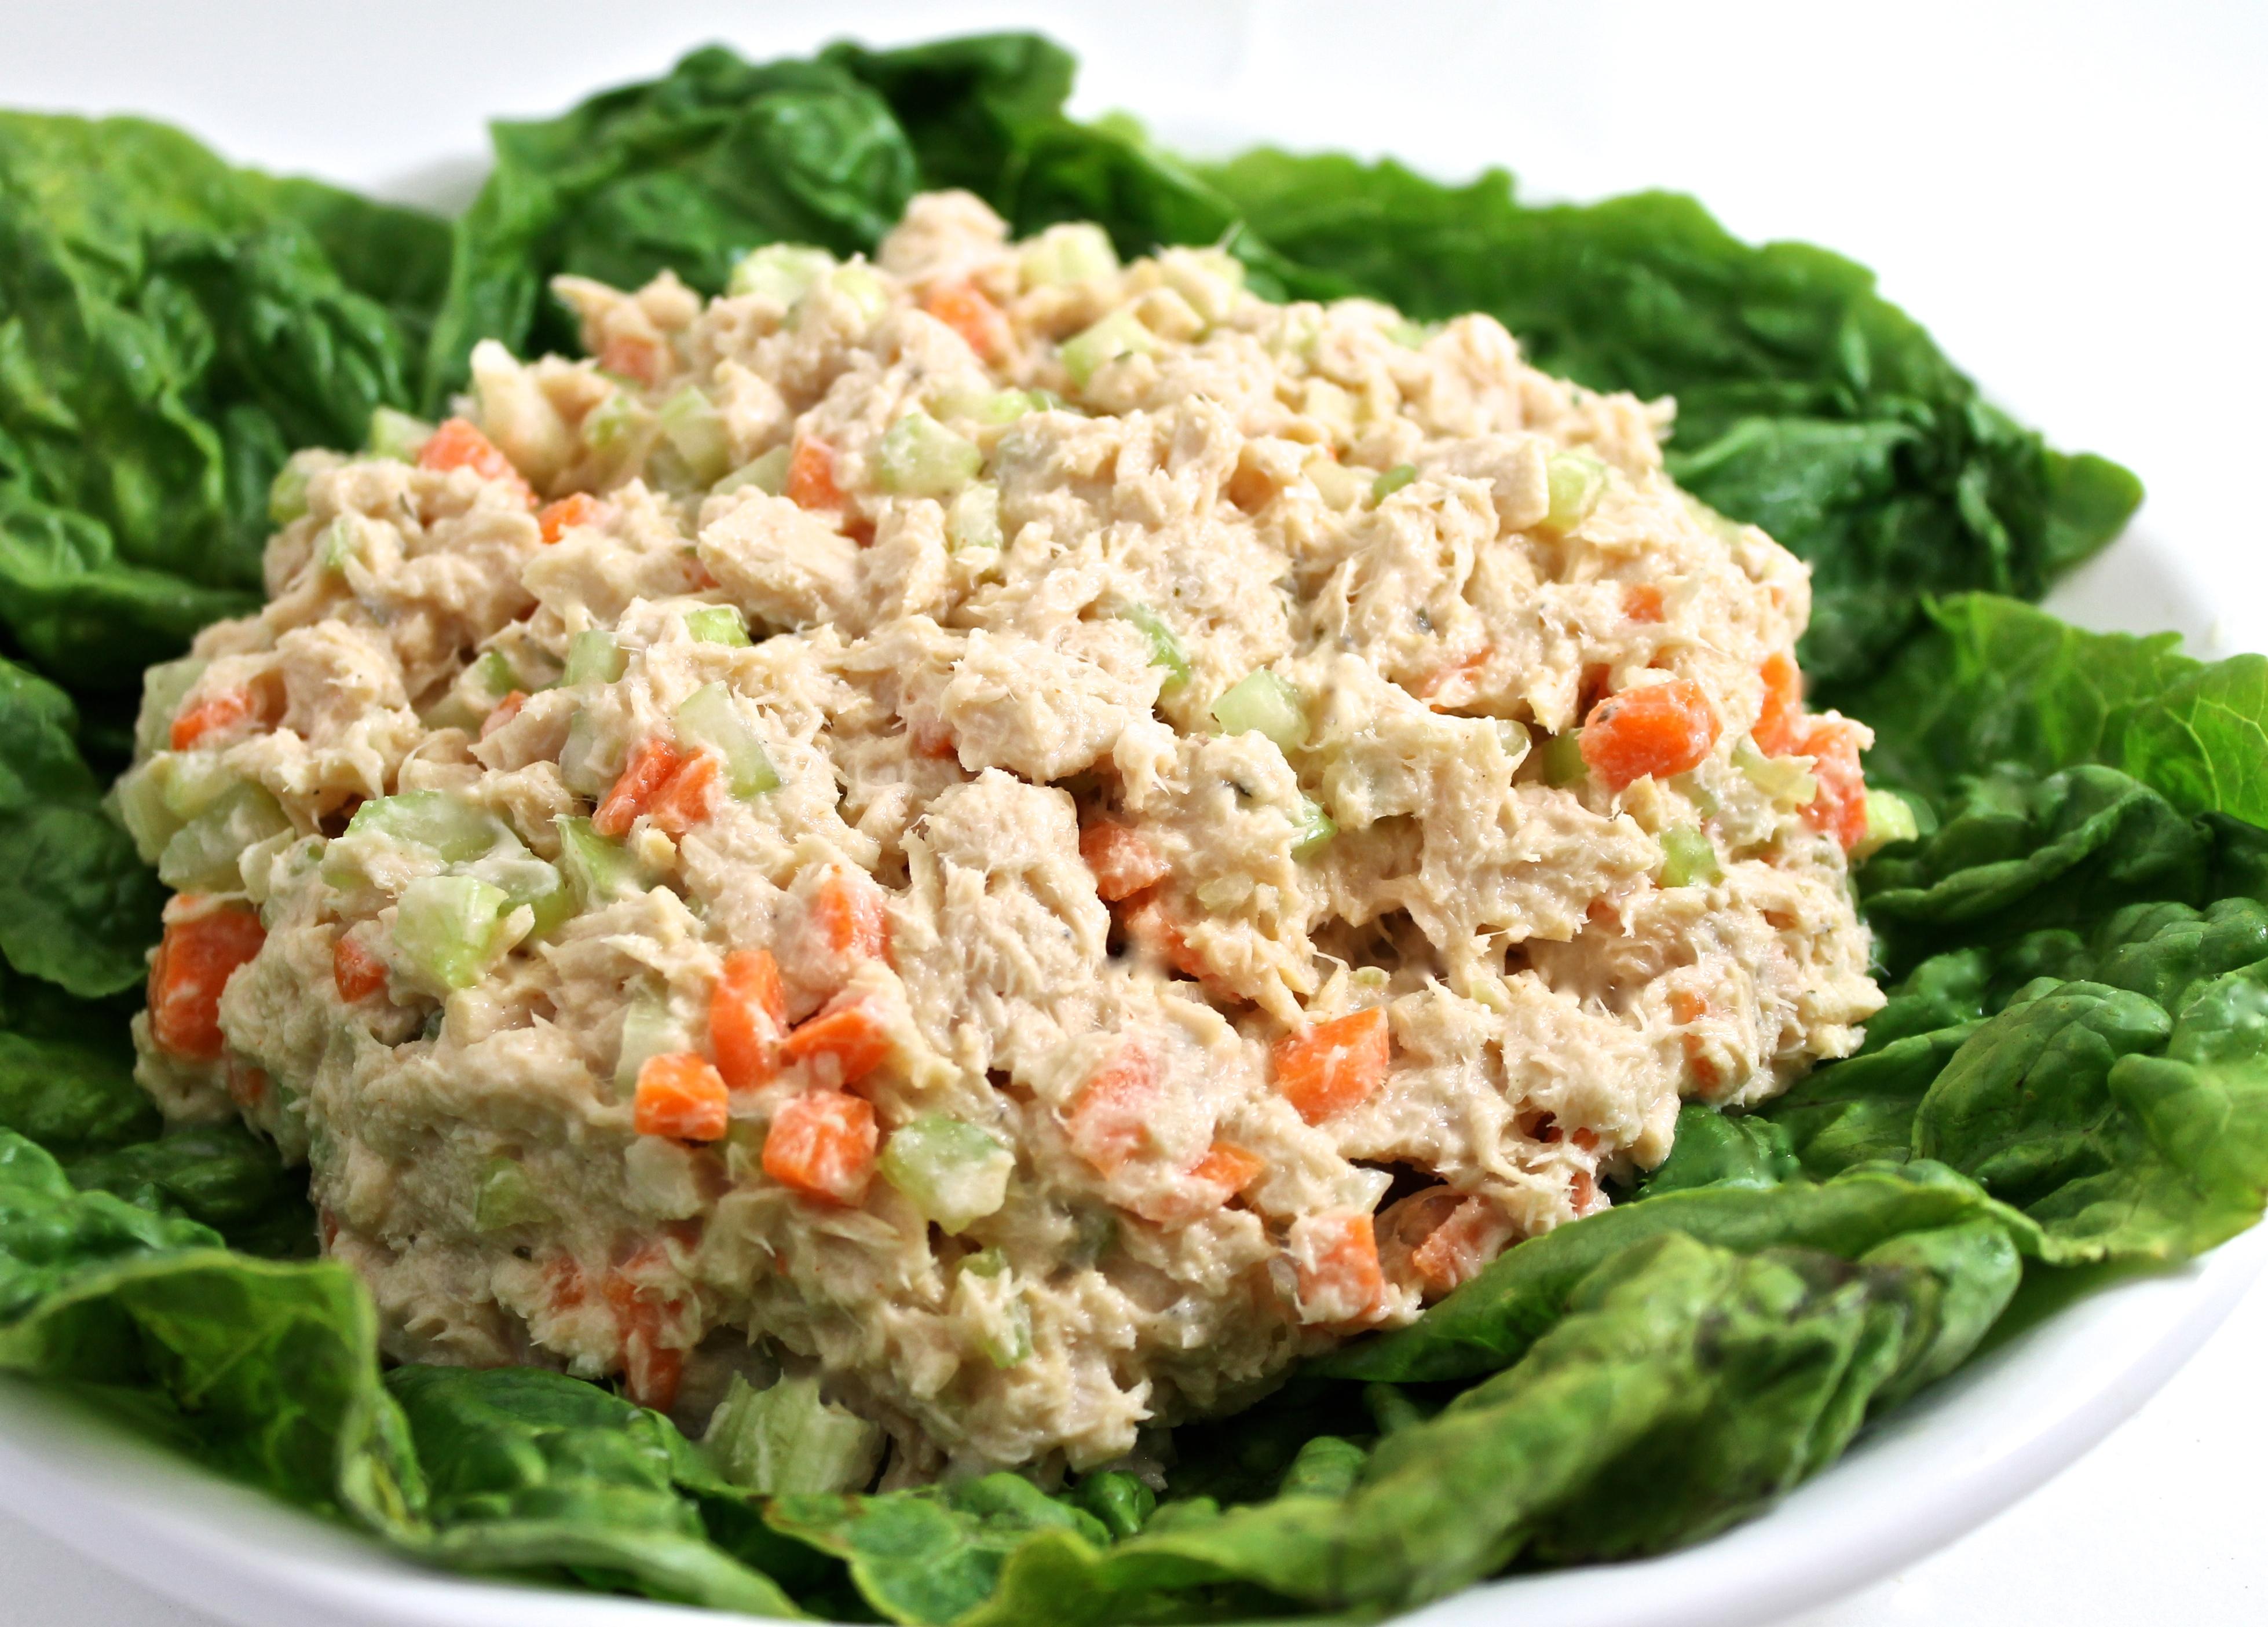 Skinny buffalo ranch tuna salad huffpost for Best tuna fish salad